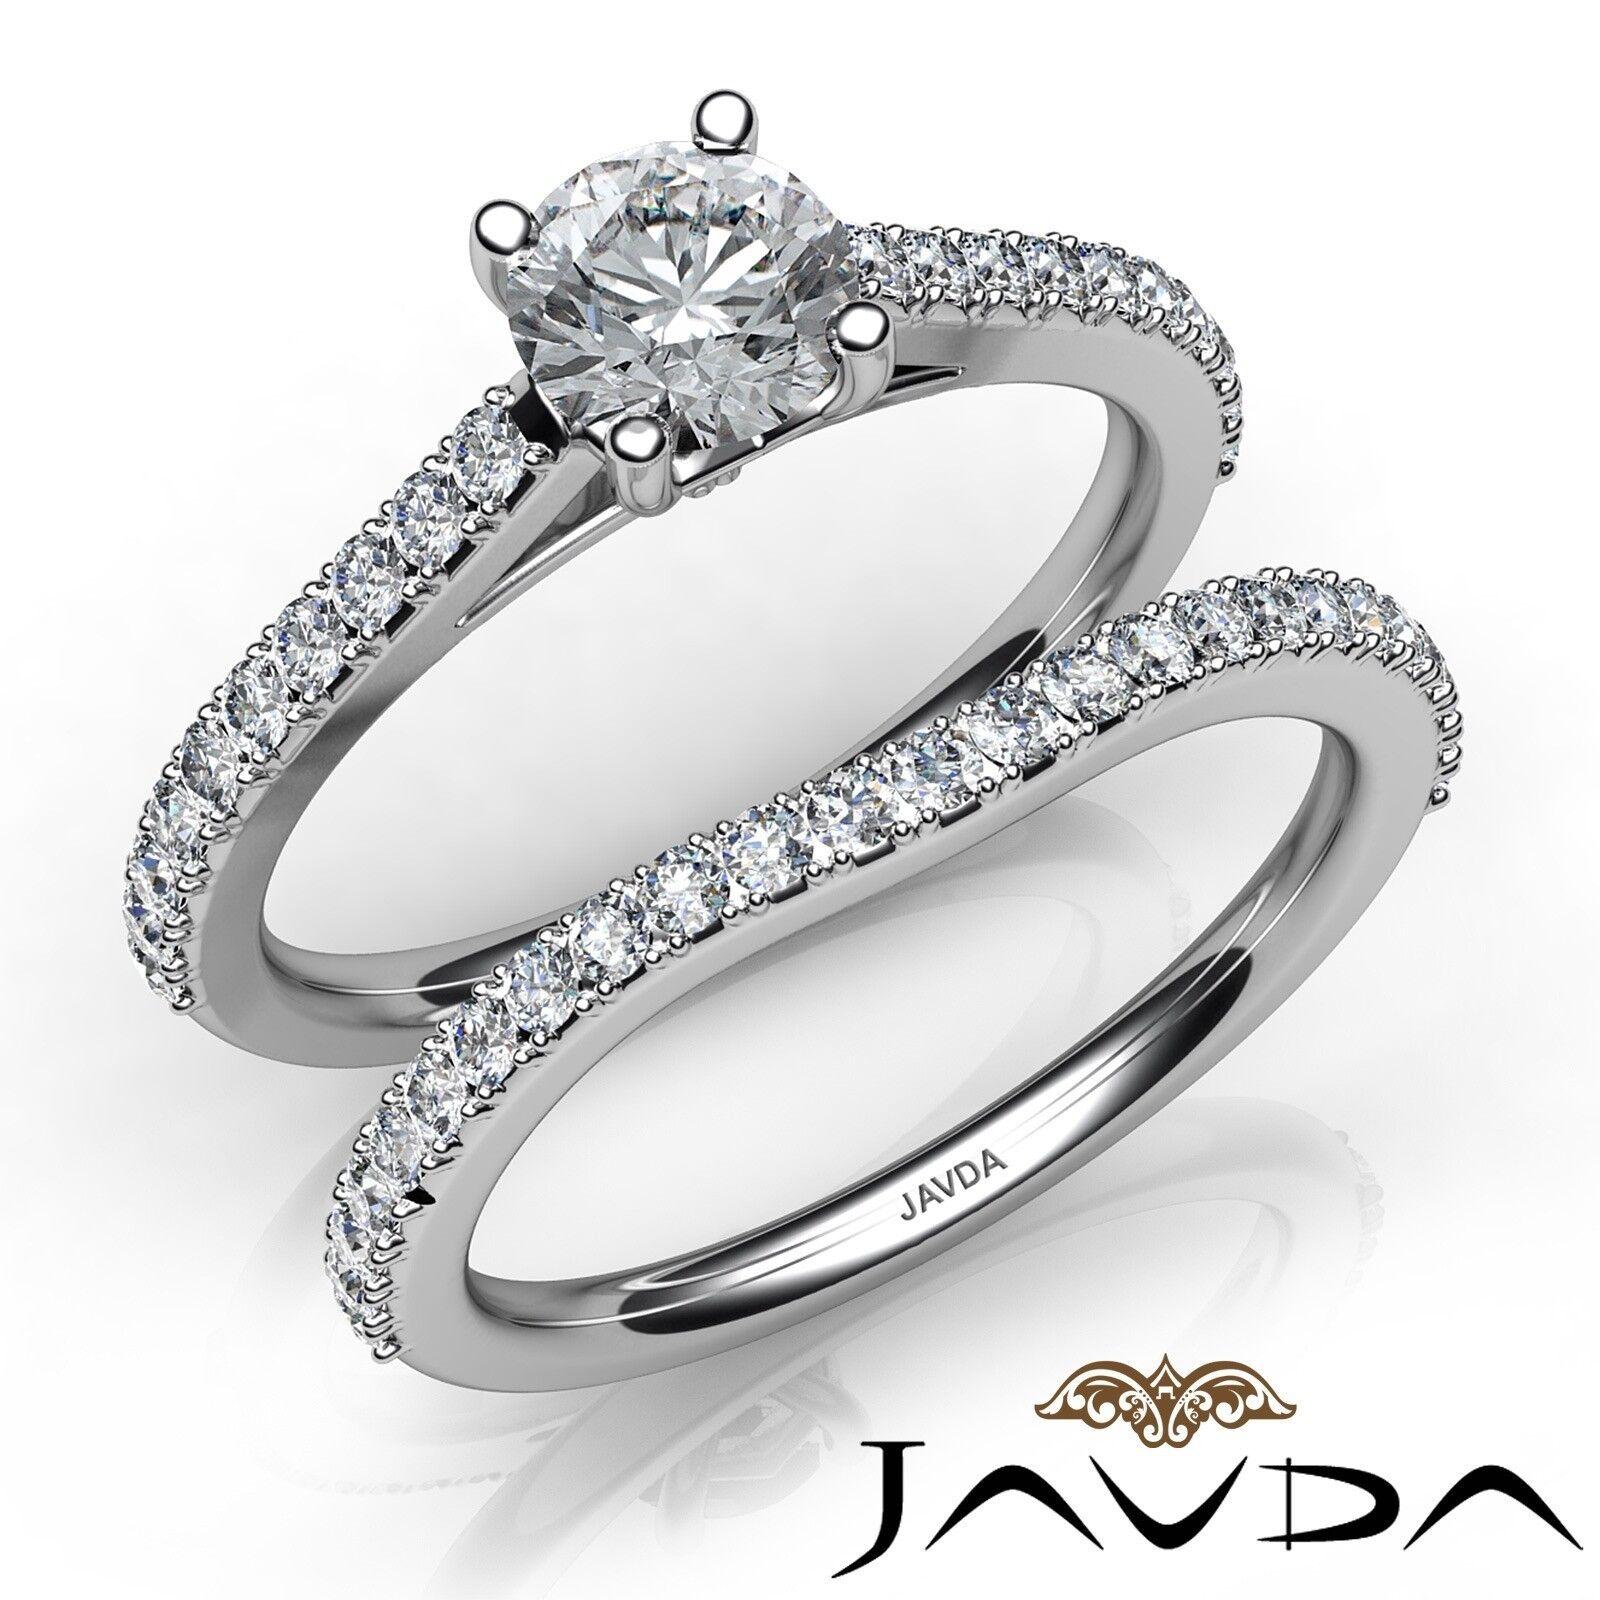 1.5ctw Prong Setting Bridal Set Round Diamond Engagement Ring GIA F-VS1 W Gold